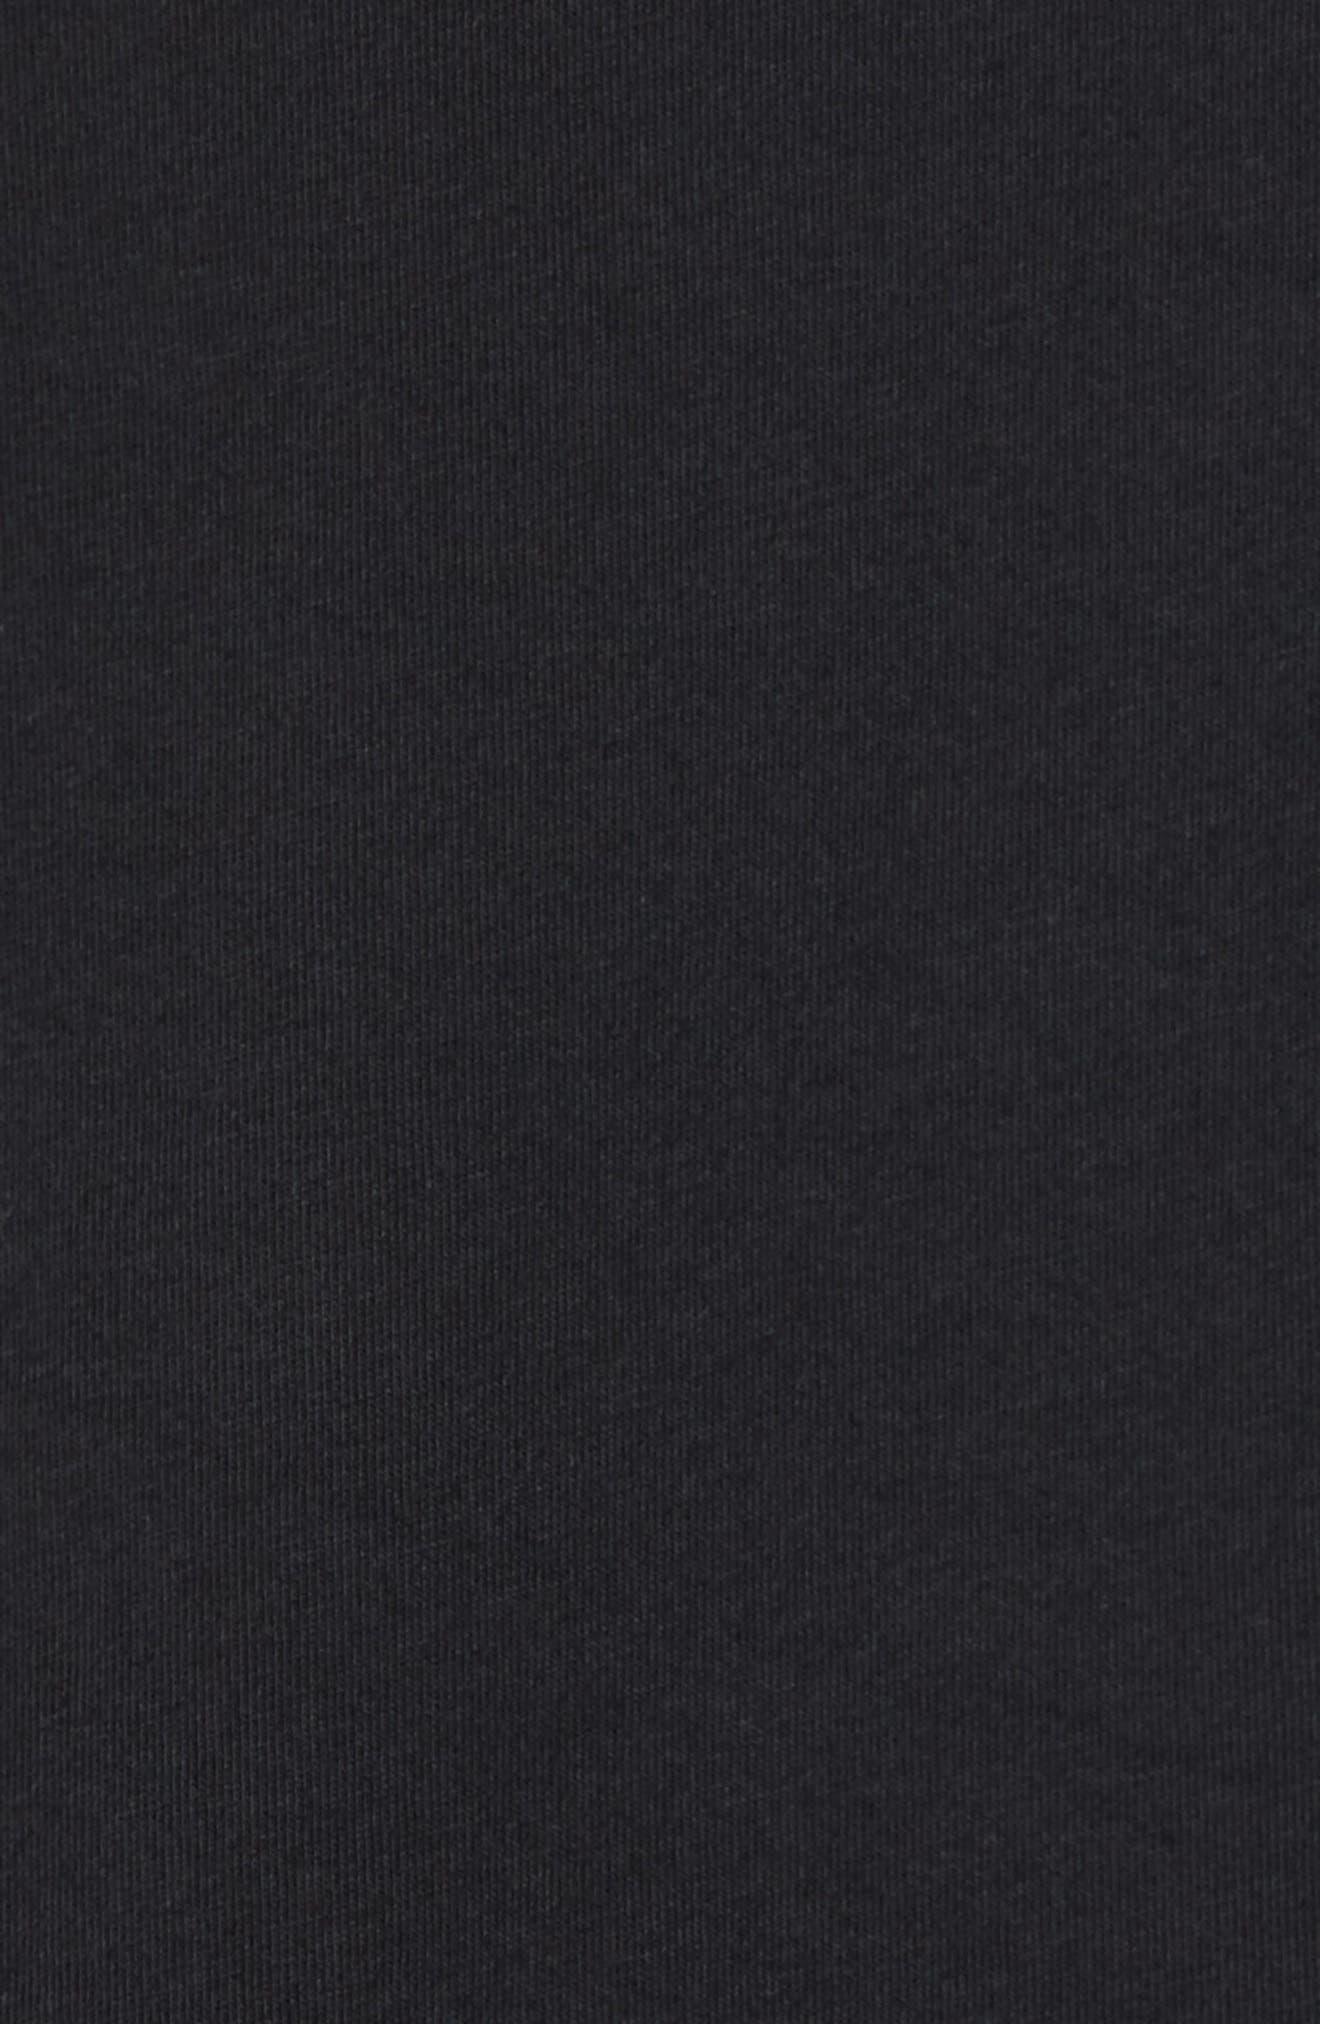 Sportswear City of Flight T-Shirt,                             Alternate thumbnail 5, color,                             Black/ White